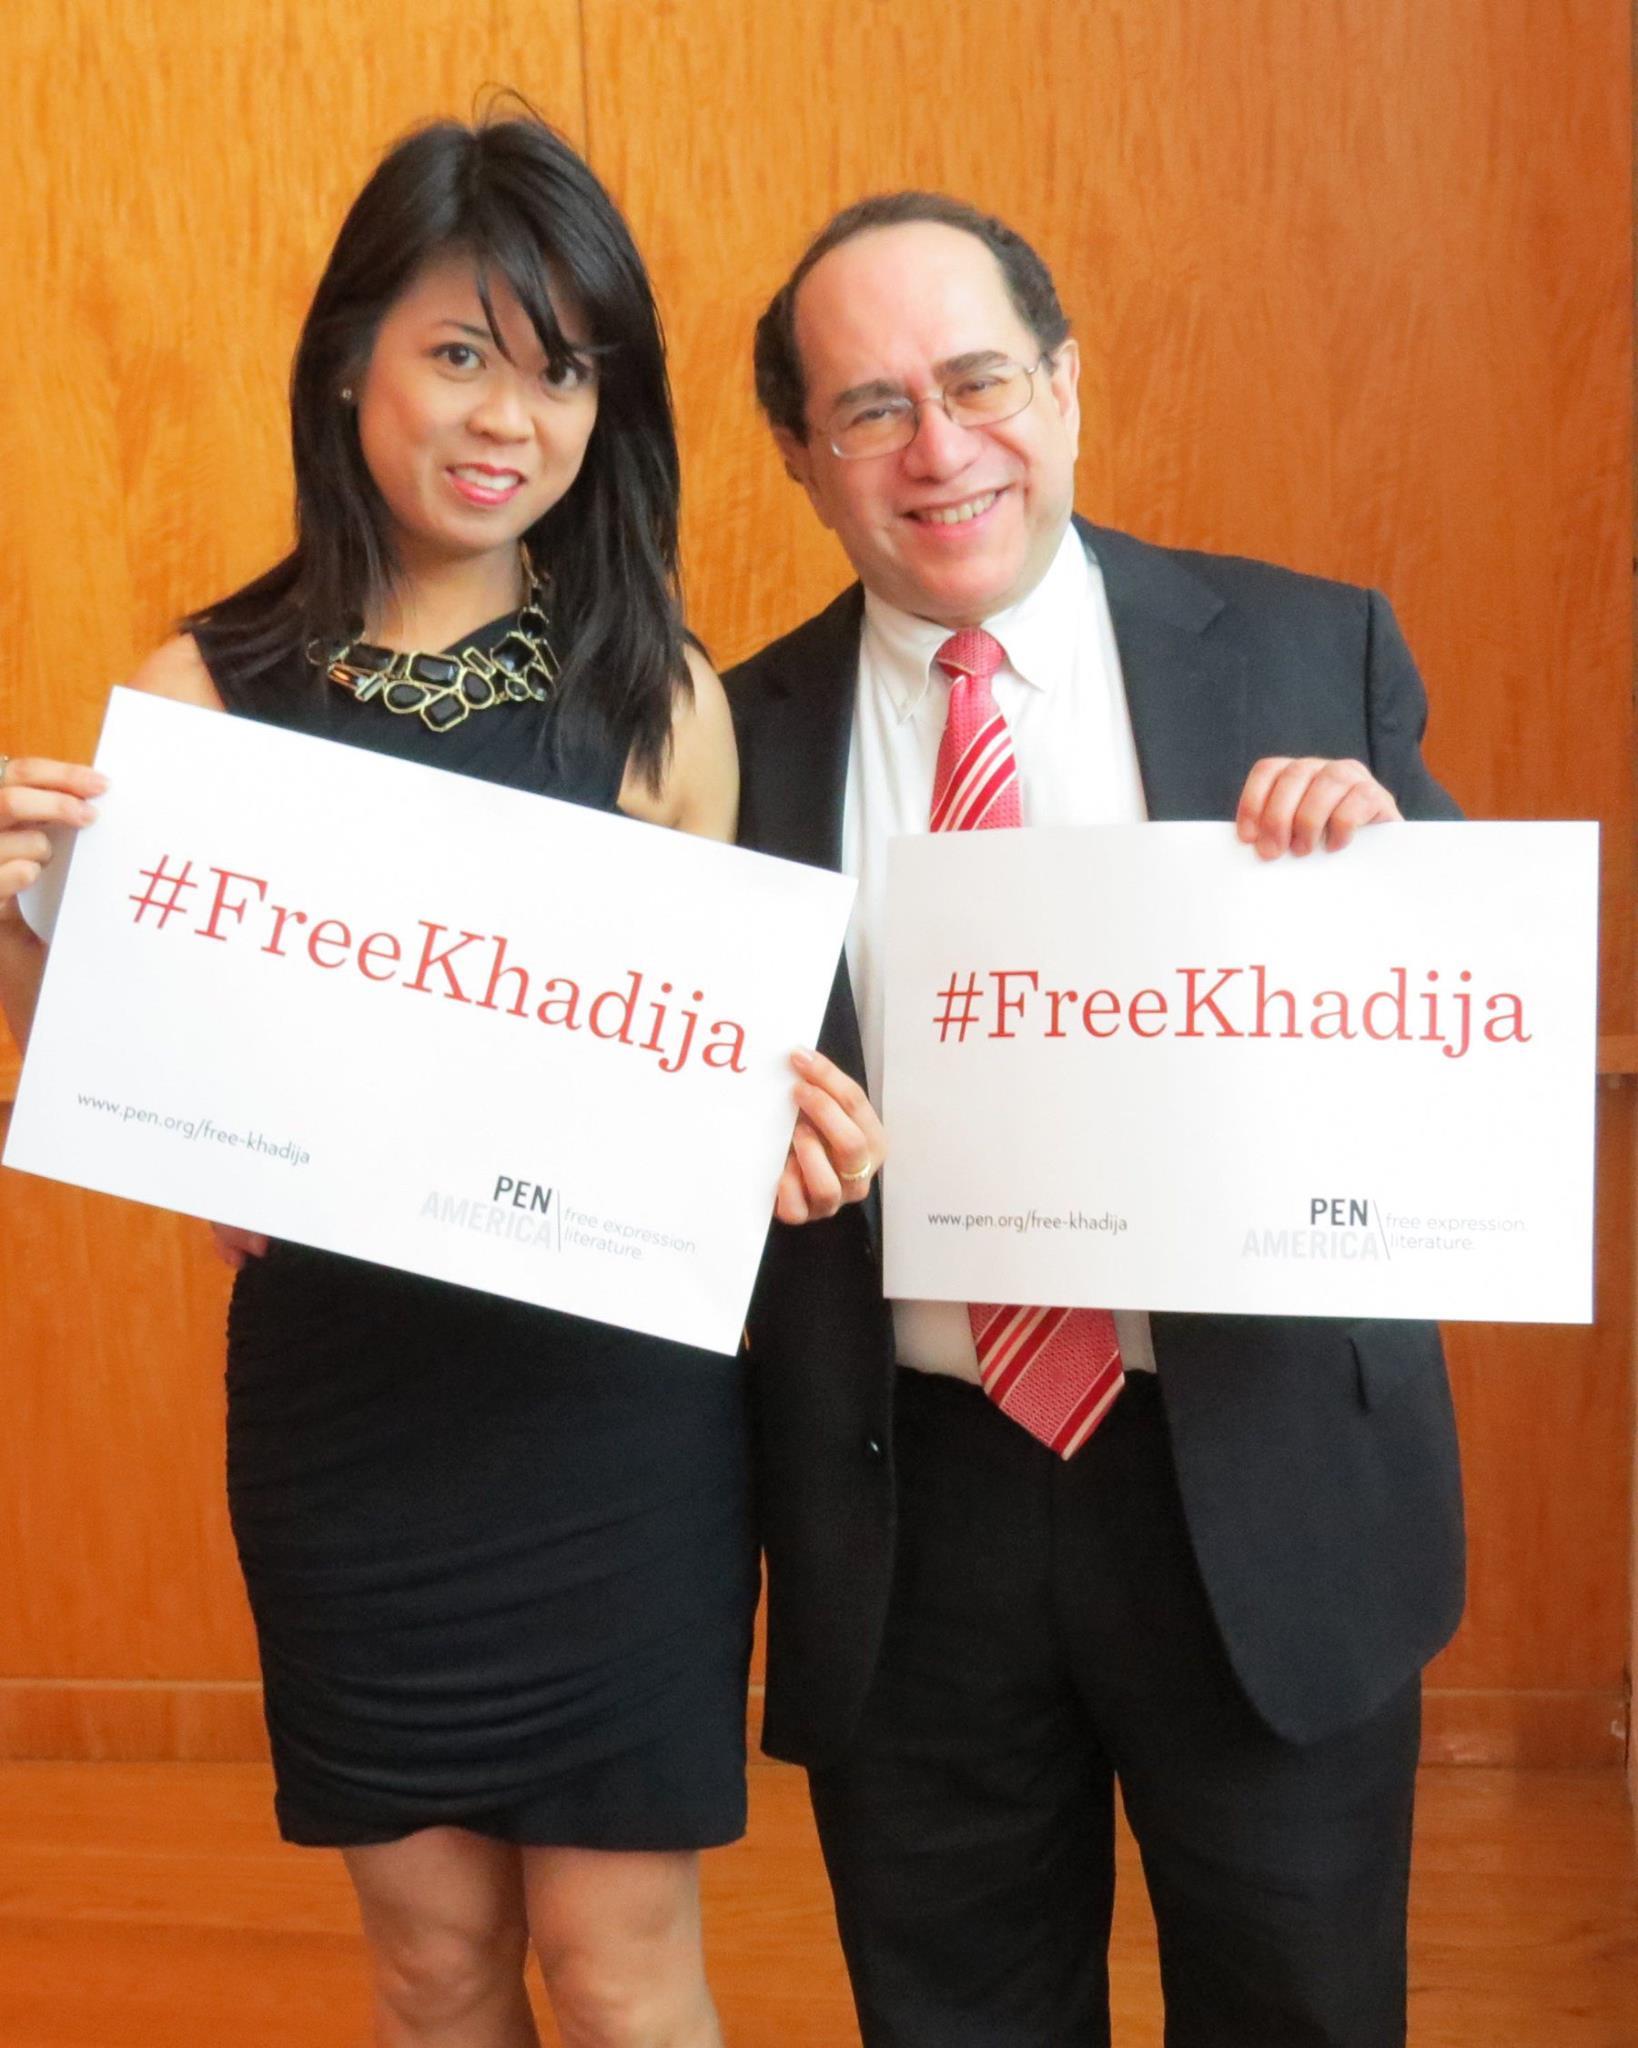  #FreeKhadija #Baku2015 #PENAwards